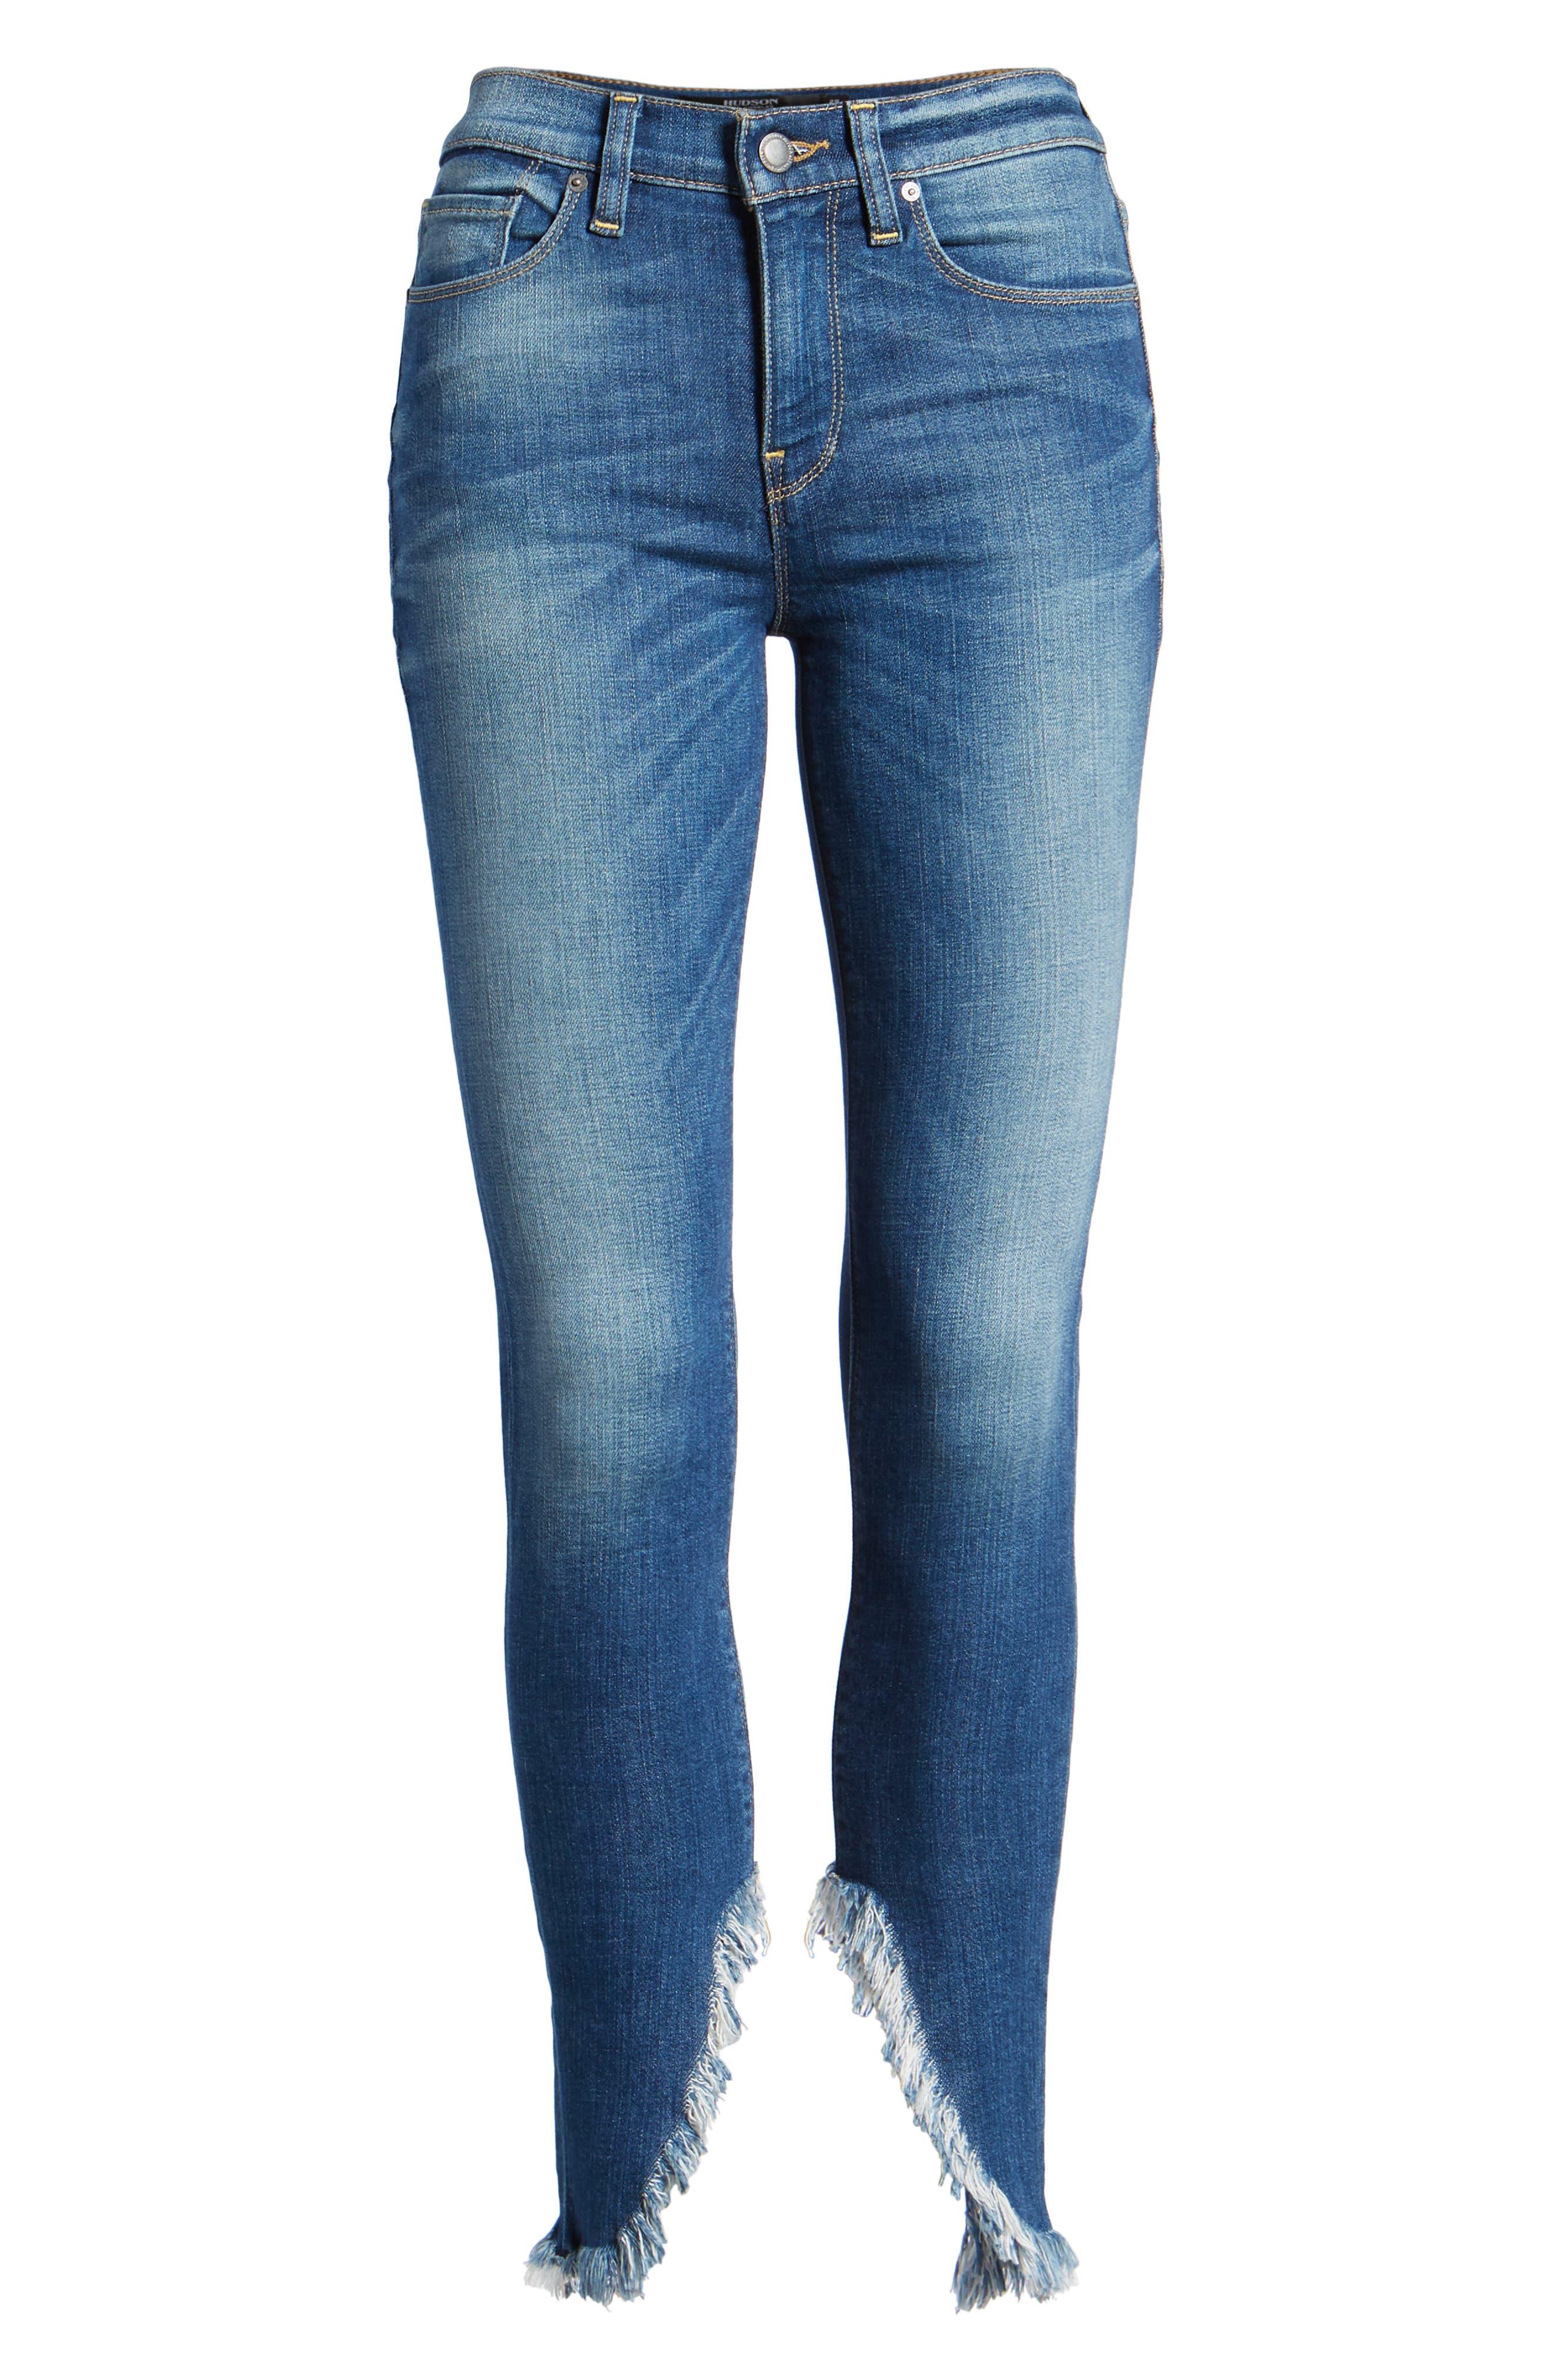 HUDSON JEANS,                             Nico Ankle Super Skinny Jeans,                             Alternate thumbnail 7, color,                             404